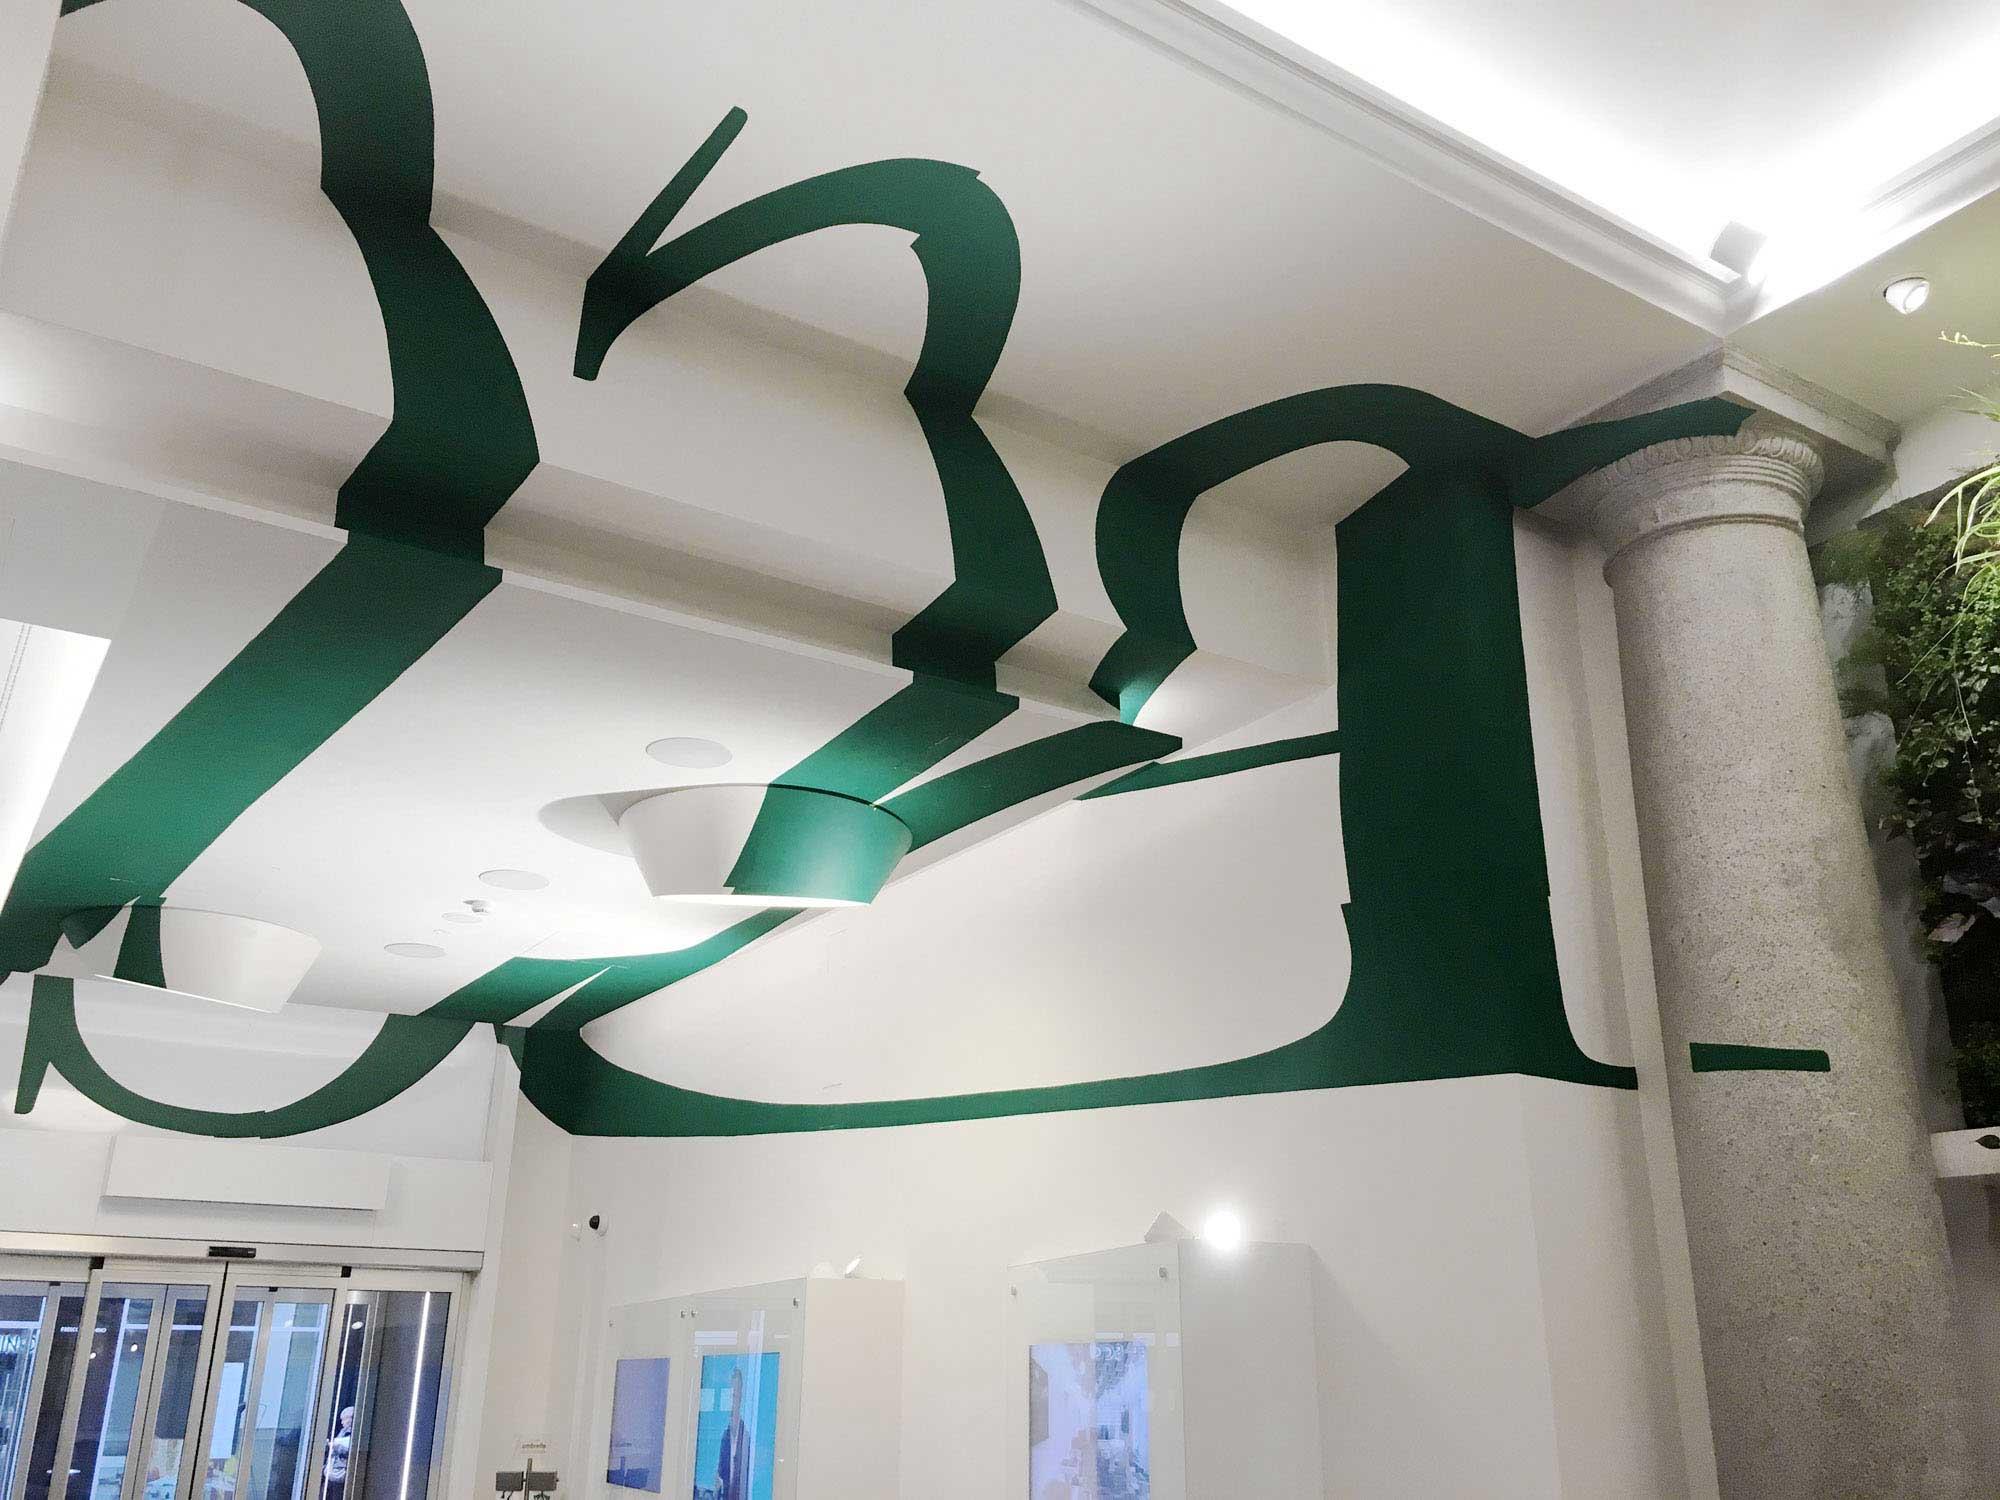 Perspektivische Malerei von Truly Design Studio Truly-Design-Studio-anamorph_15